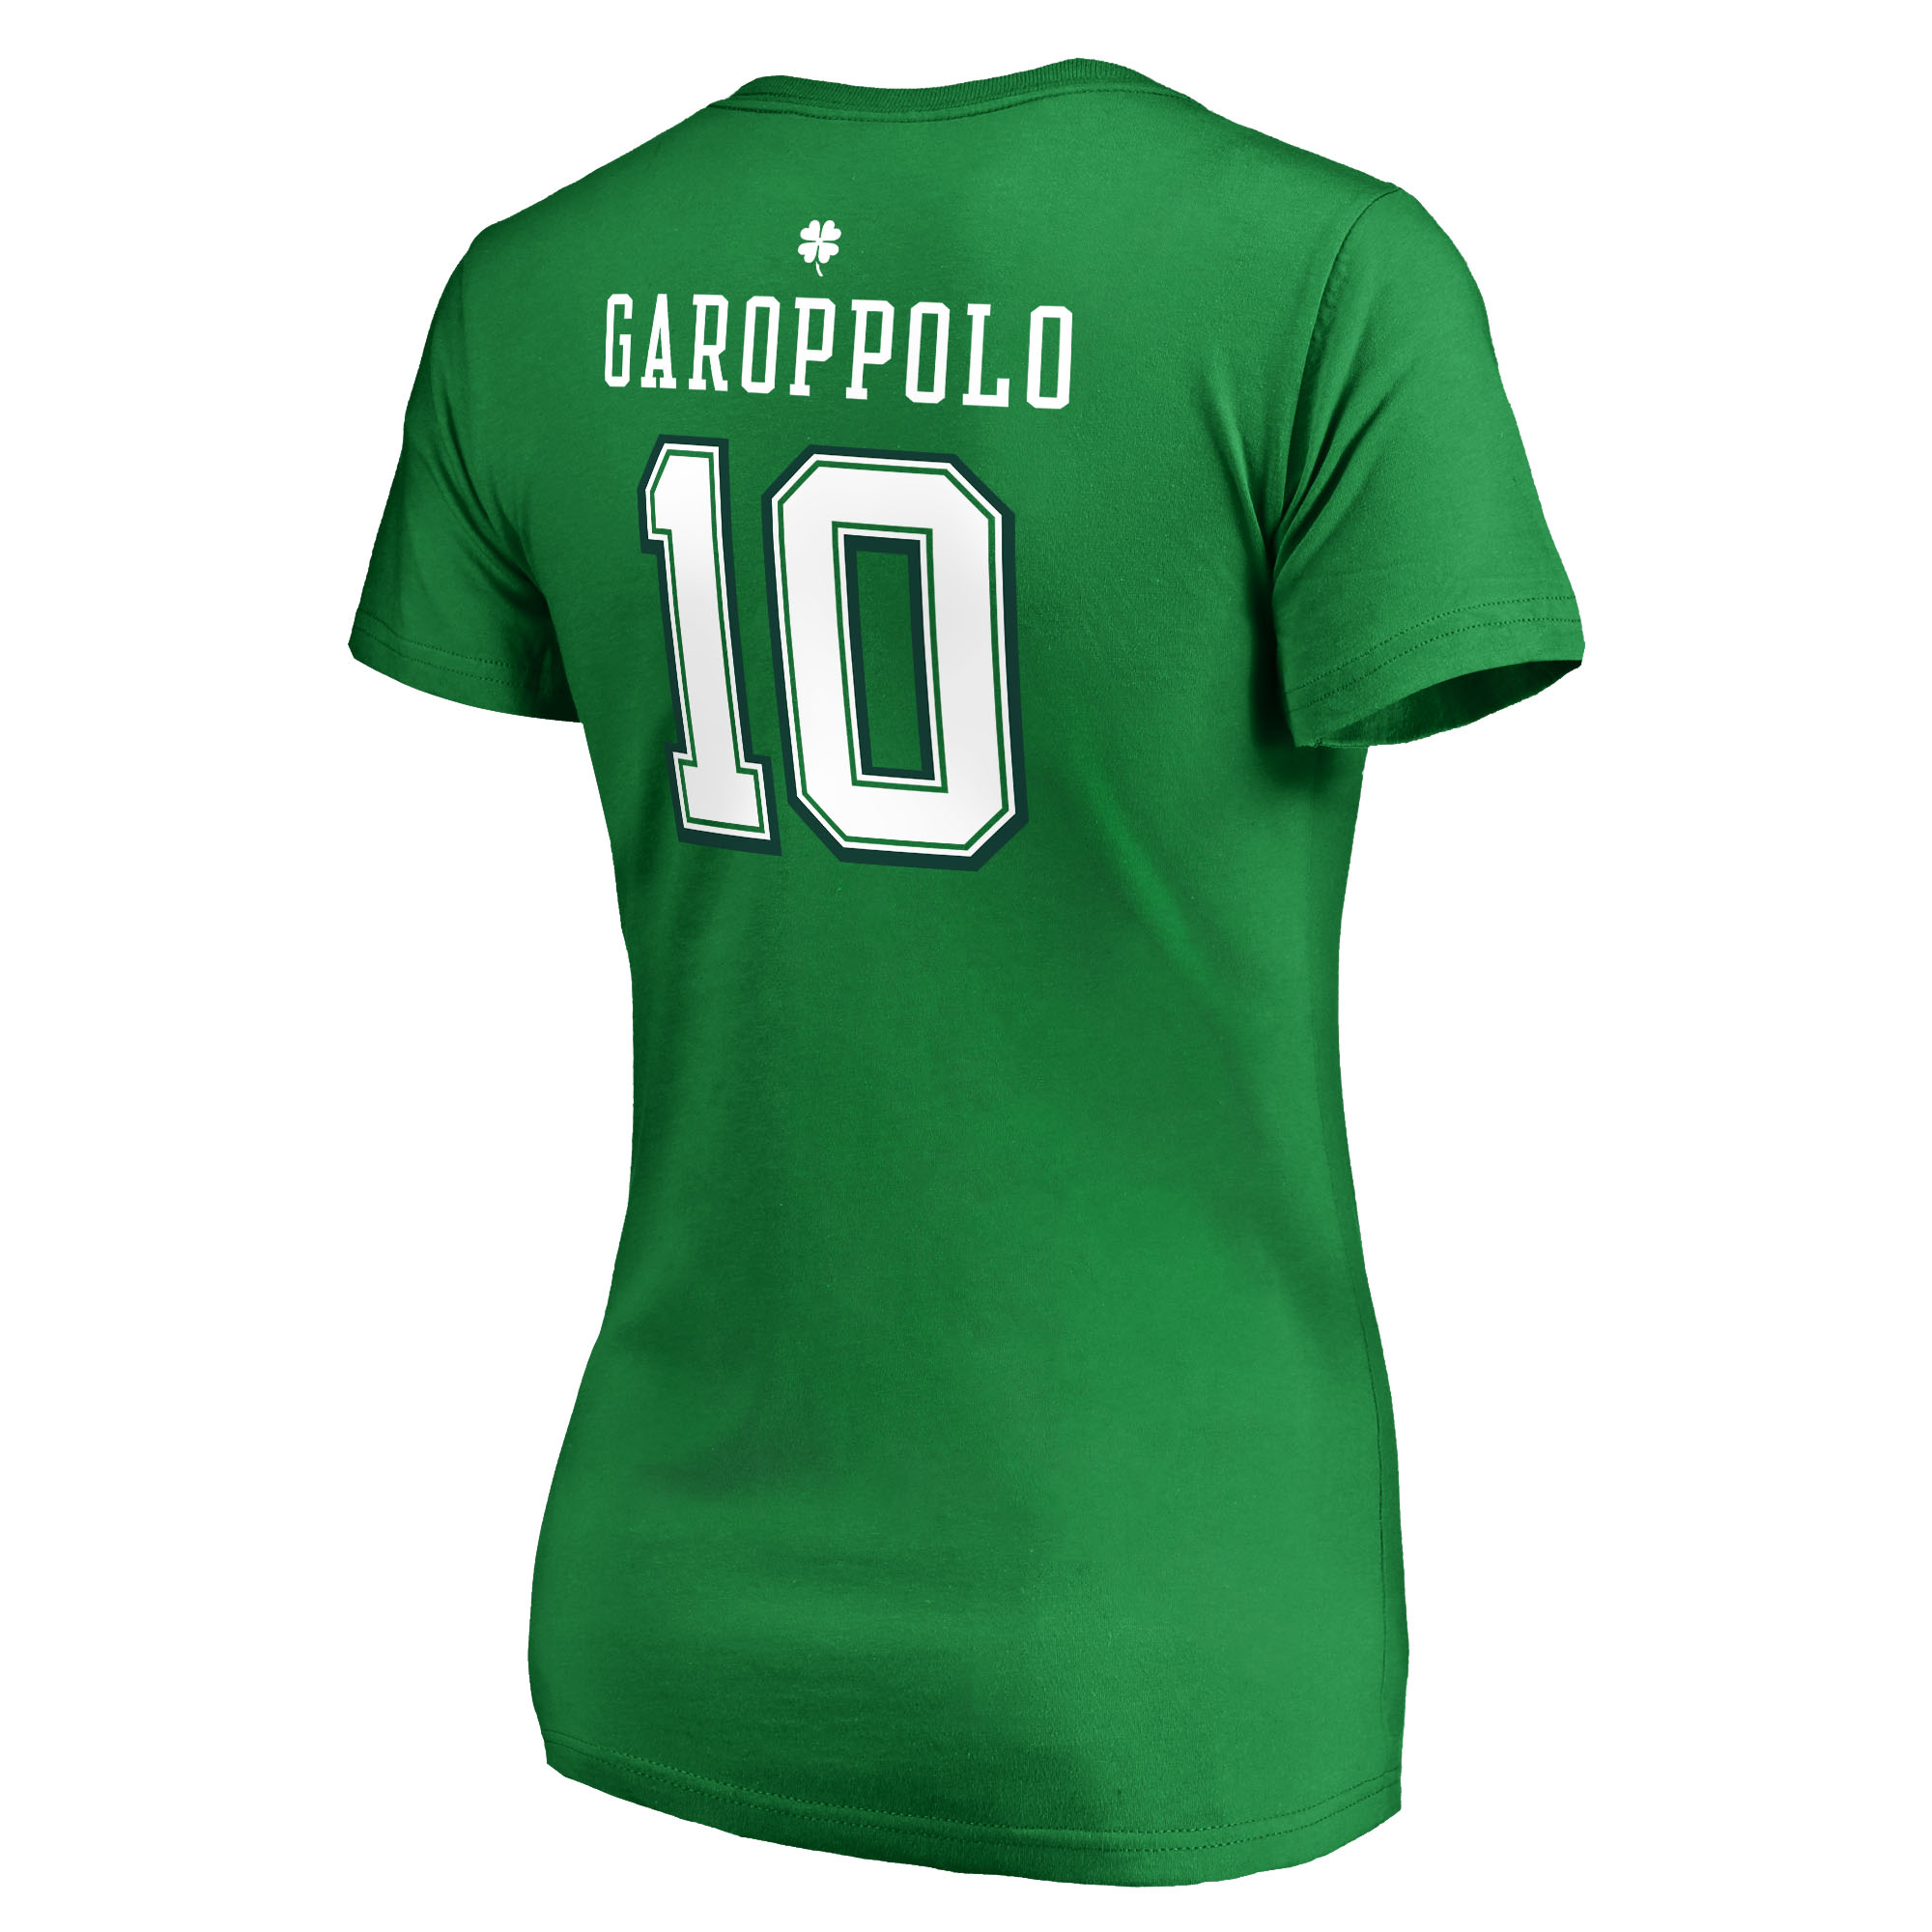 3d8e60b77 Jimmy Garoppolo San Francisco 49ers NFL Pro Line by Fanatics Branded Women's  St. Patrick's Day Icon V-Neck Name & Number T-Shirt - Kelly Green -  Walmart.com